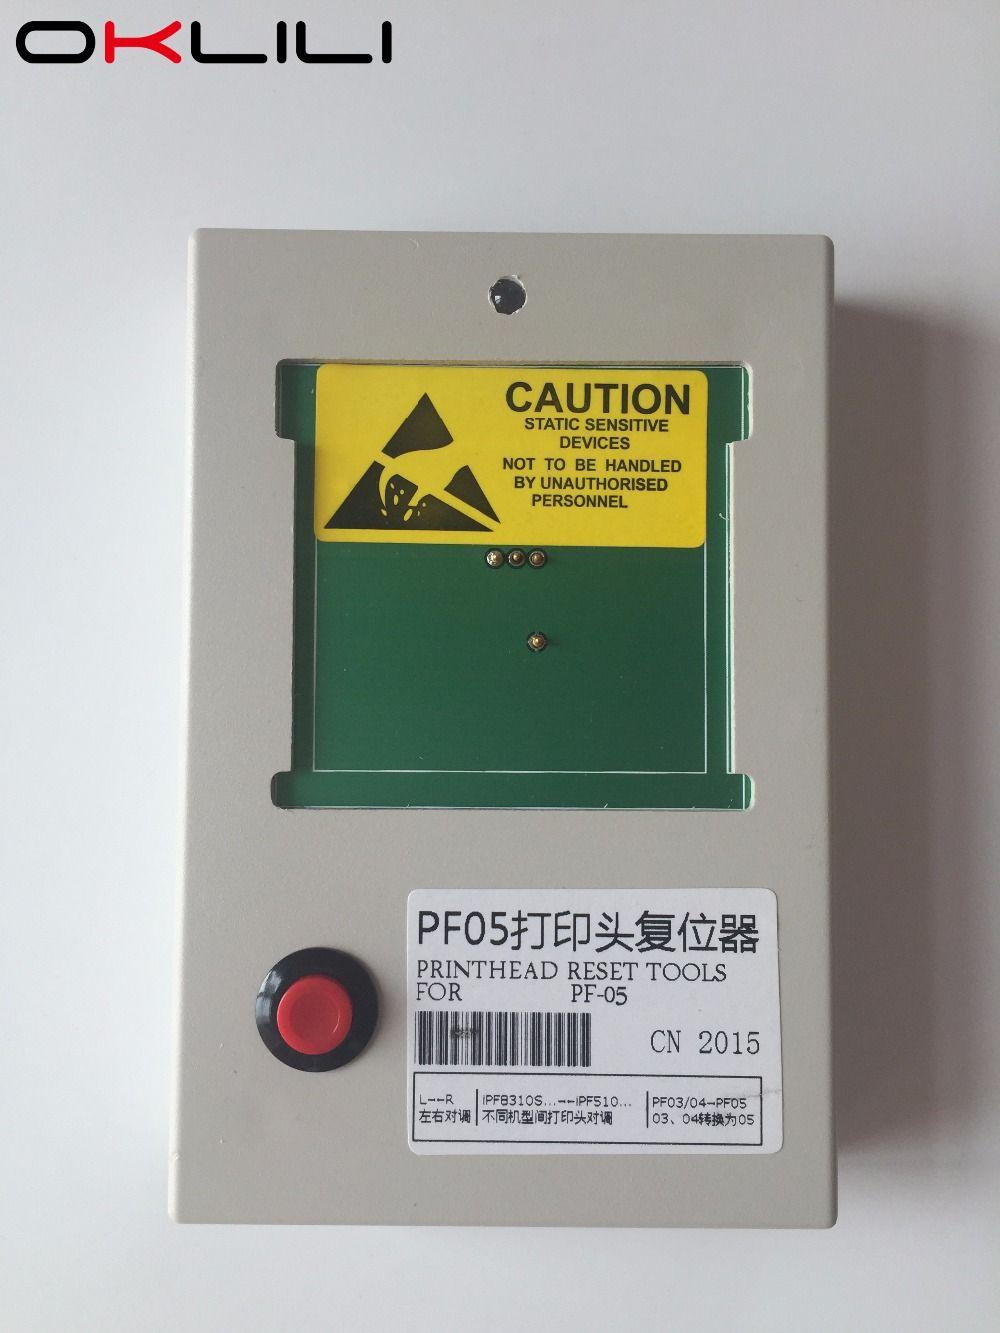 PF-05 Reset PrintHead Print Head Printer Head Chip Resetter Decoder for Canon iPF6300 6350 6400 6450 6460 8300 8300S 8400 9400